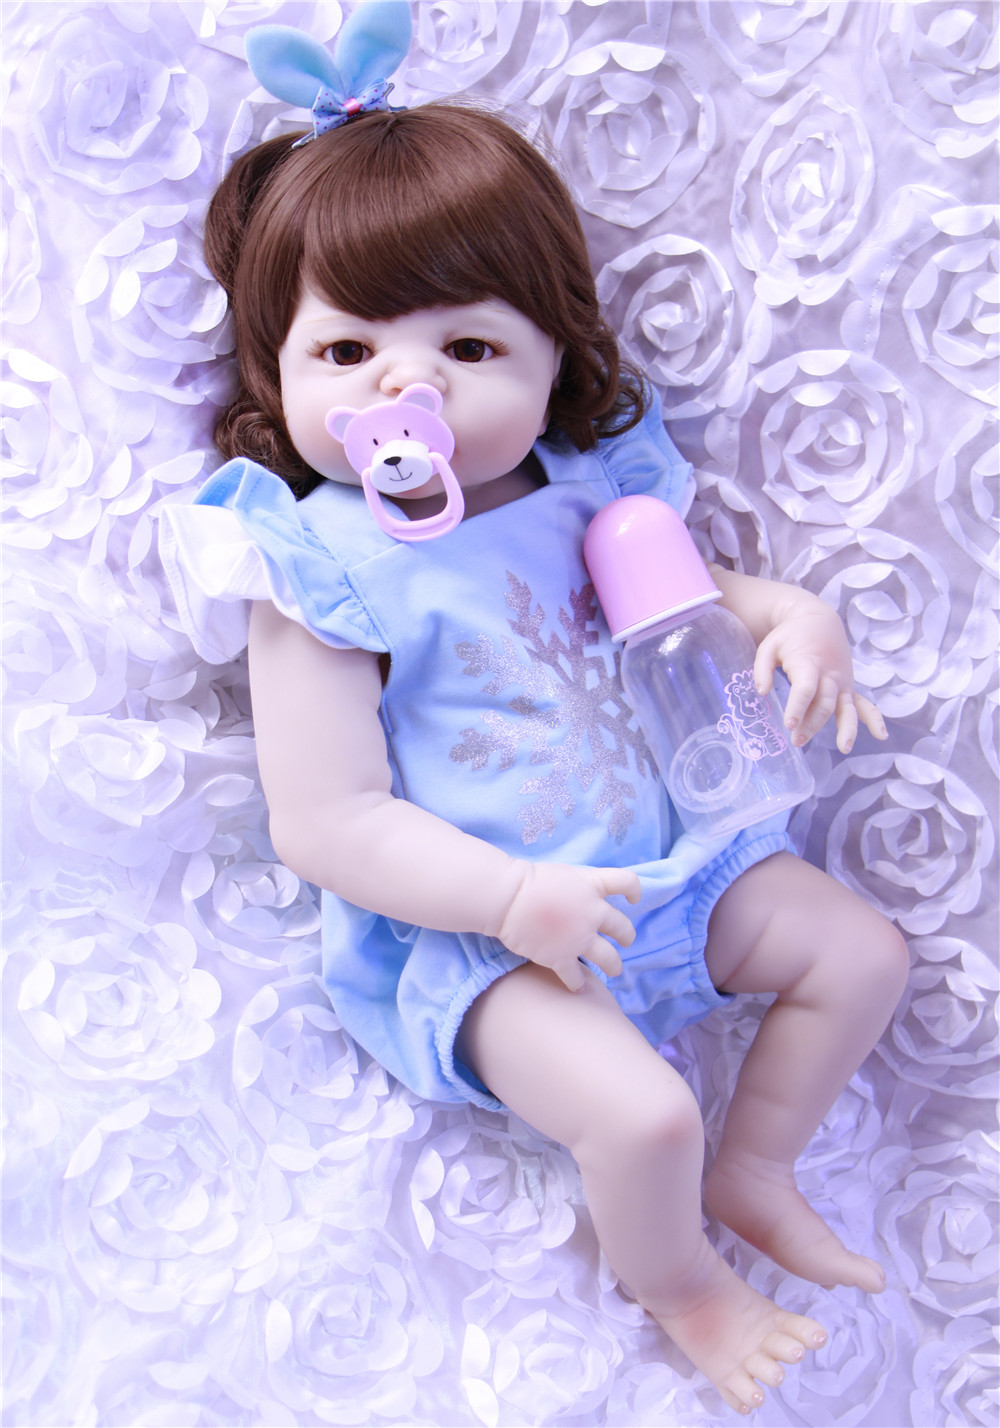 23inch Full silicone reborn baby dolls Toy Baby-Reborn lifelike modeling vinyl newborn bathe infant toddler kids toys23inch Full silicone reborn baby dolls Toy Baby-Reborn lifelike modeling vinyl newborn bathe infant toddler kids toys